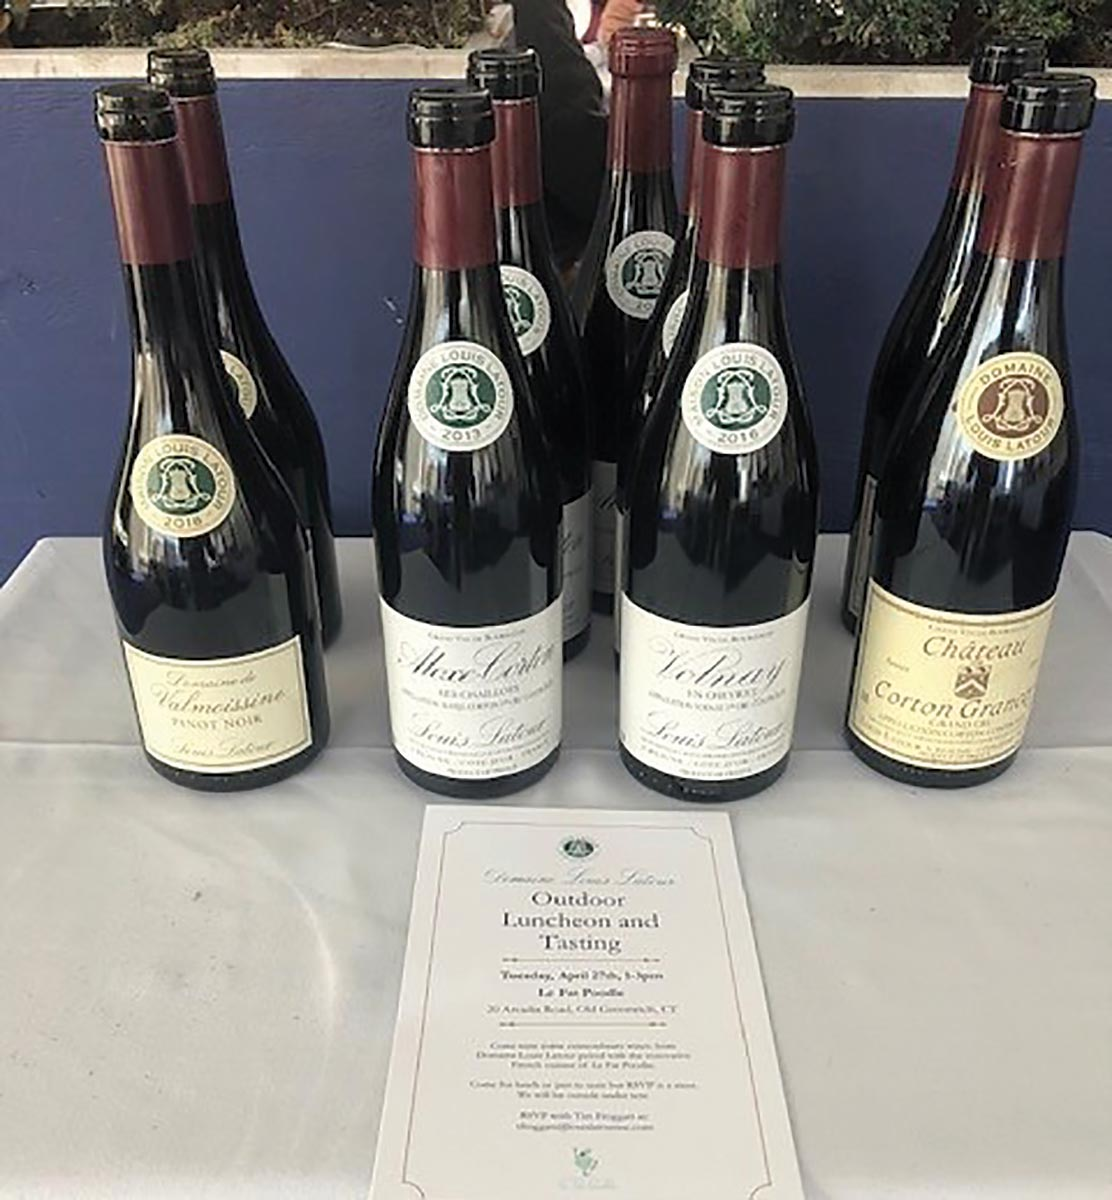 Monsieur Touton Hosts Latour Wine Luncheon